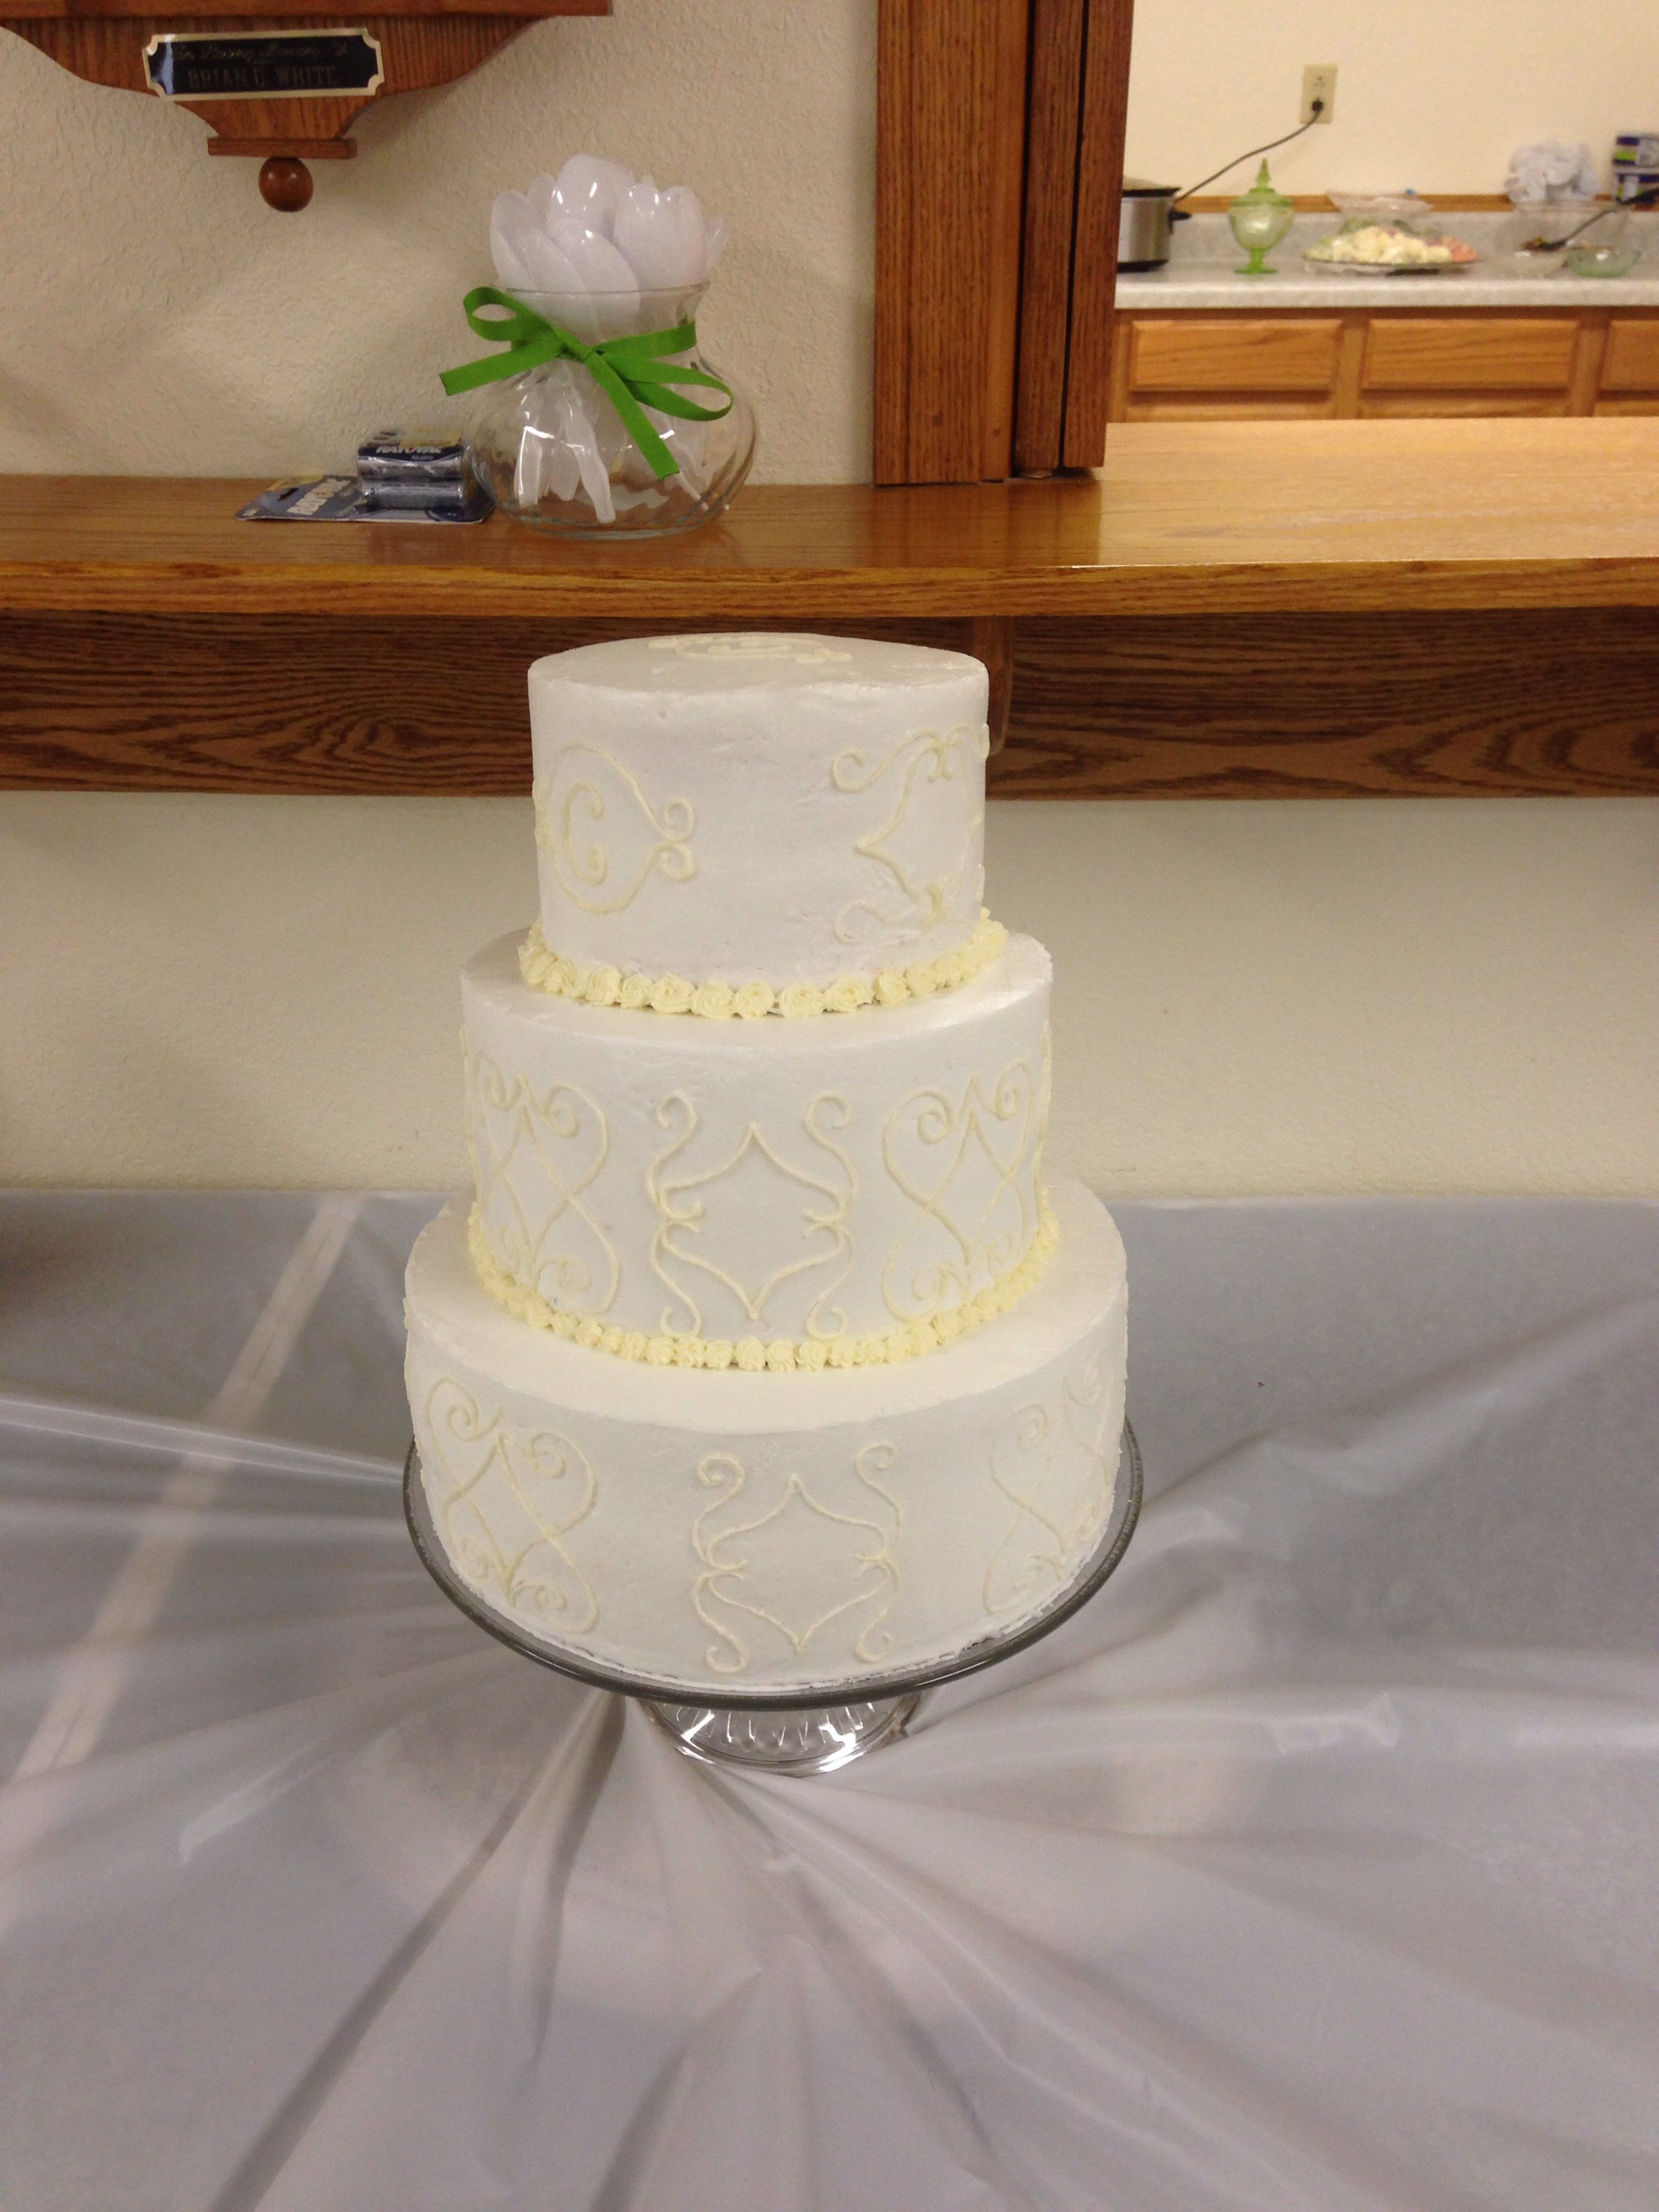 Steph's wedding cake